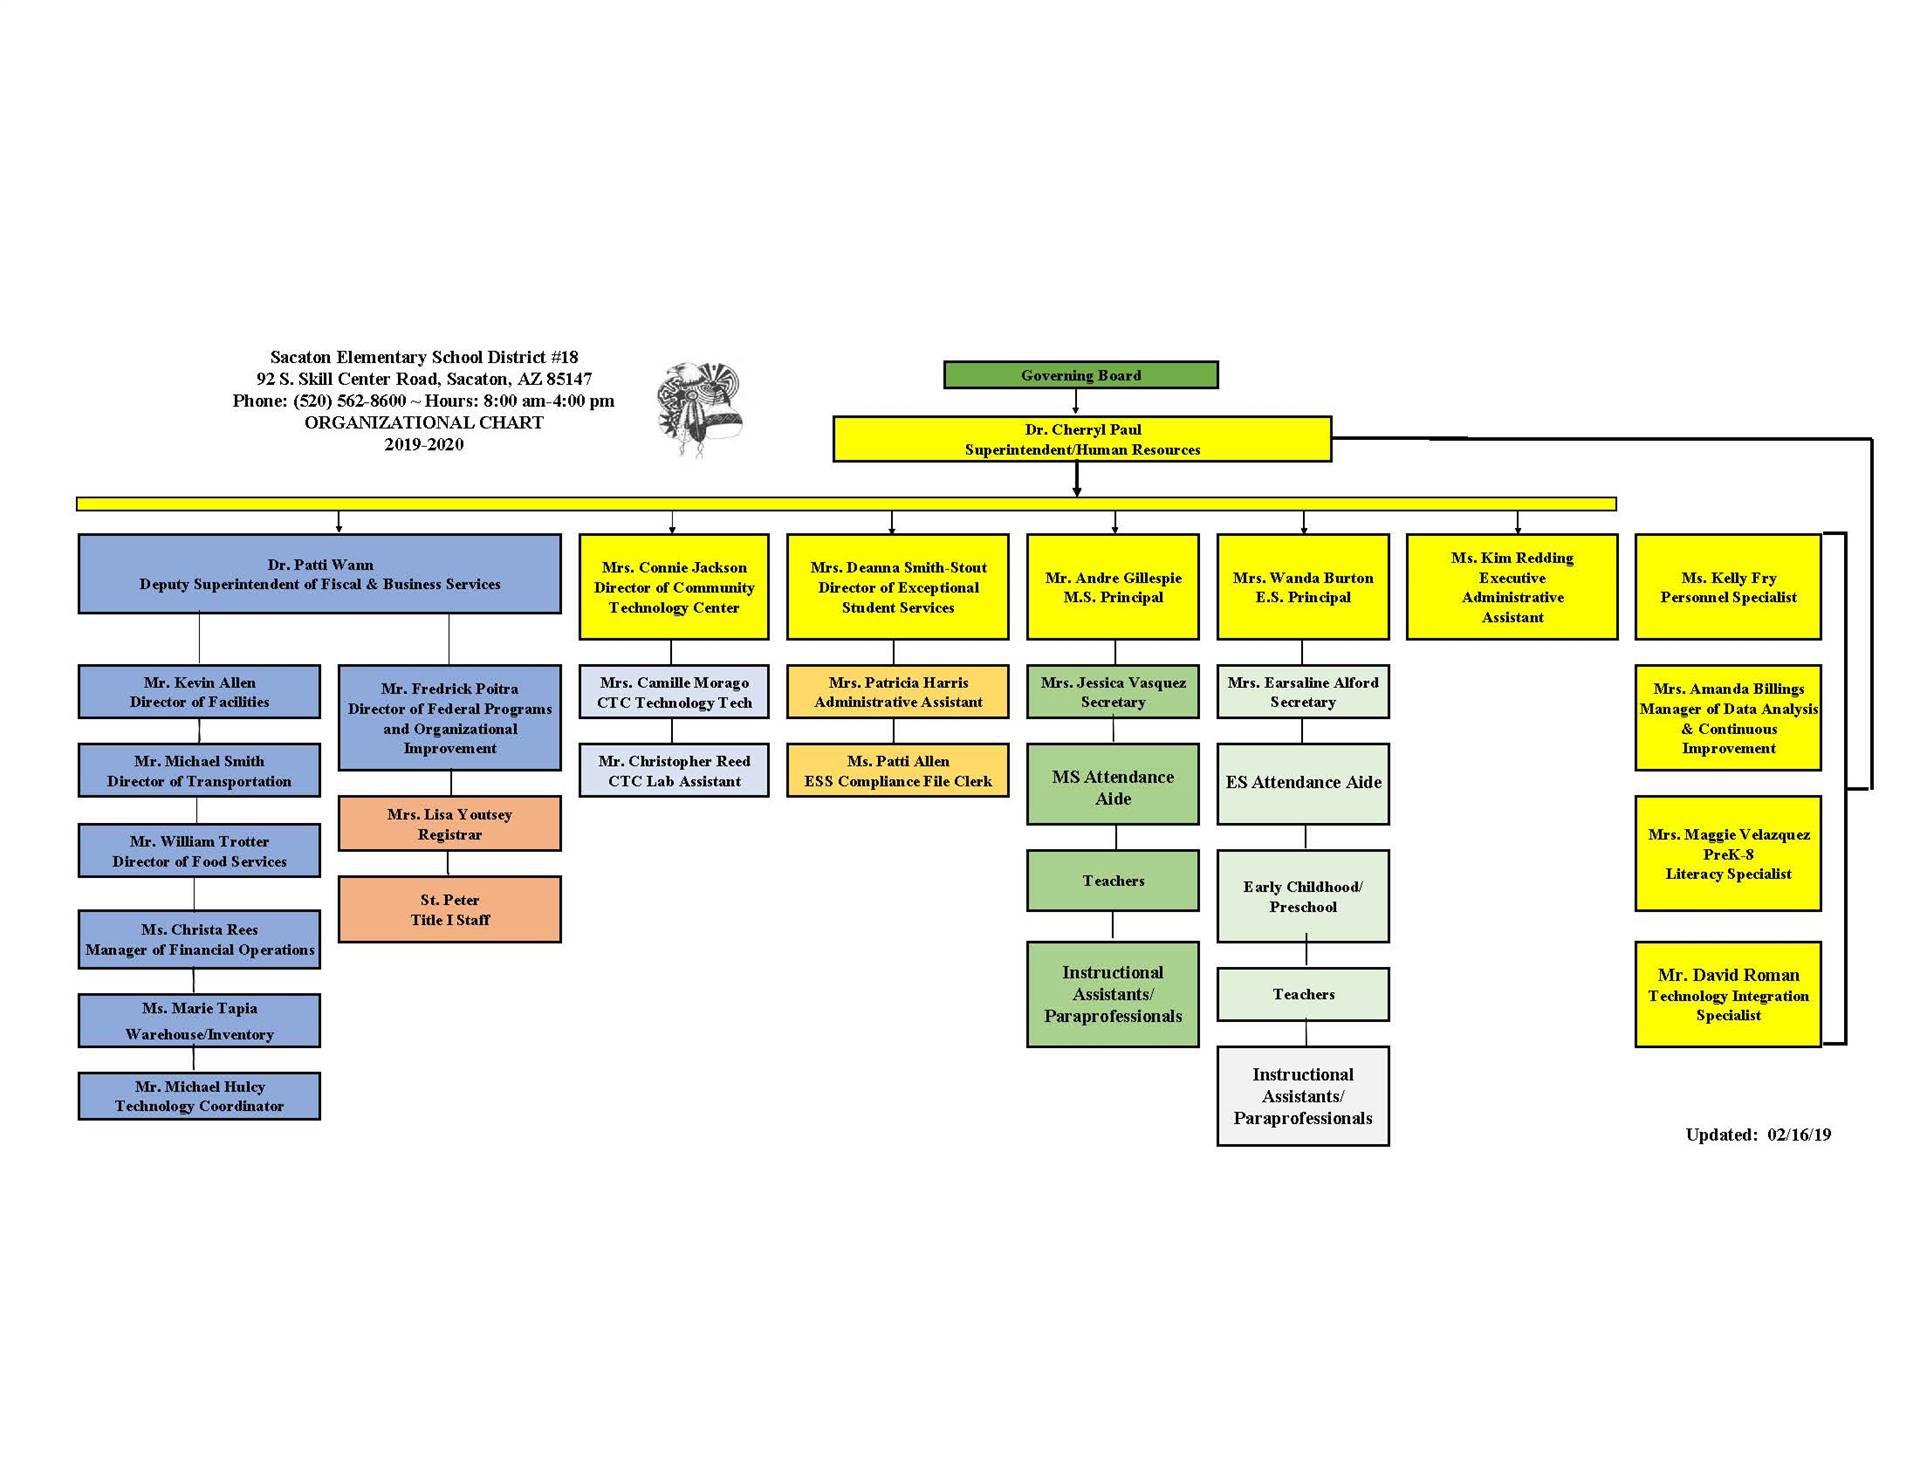 2019-2020 Org Chart